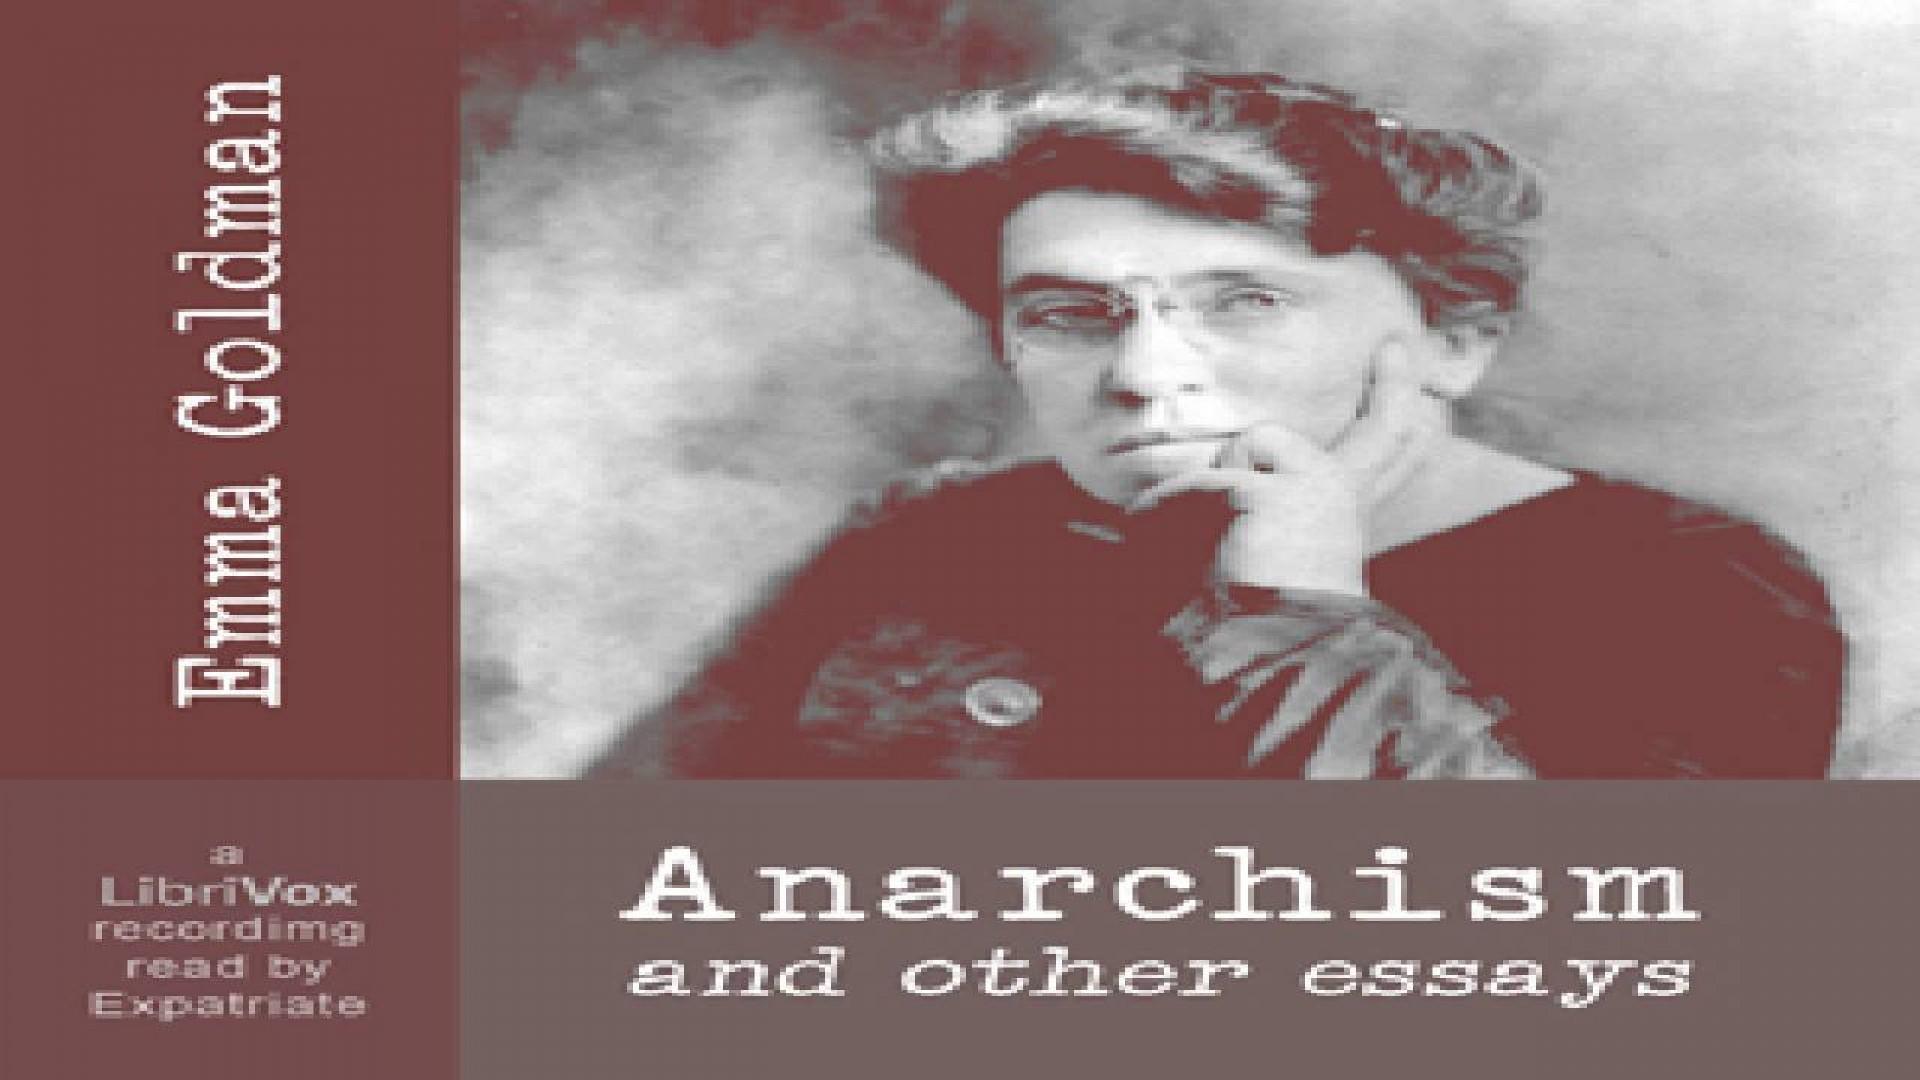 010 Emmagoldman11 Anarchism And Other Essays Essay Incredible Emma Goldman Summary Pdf 1920